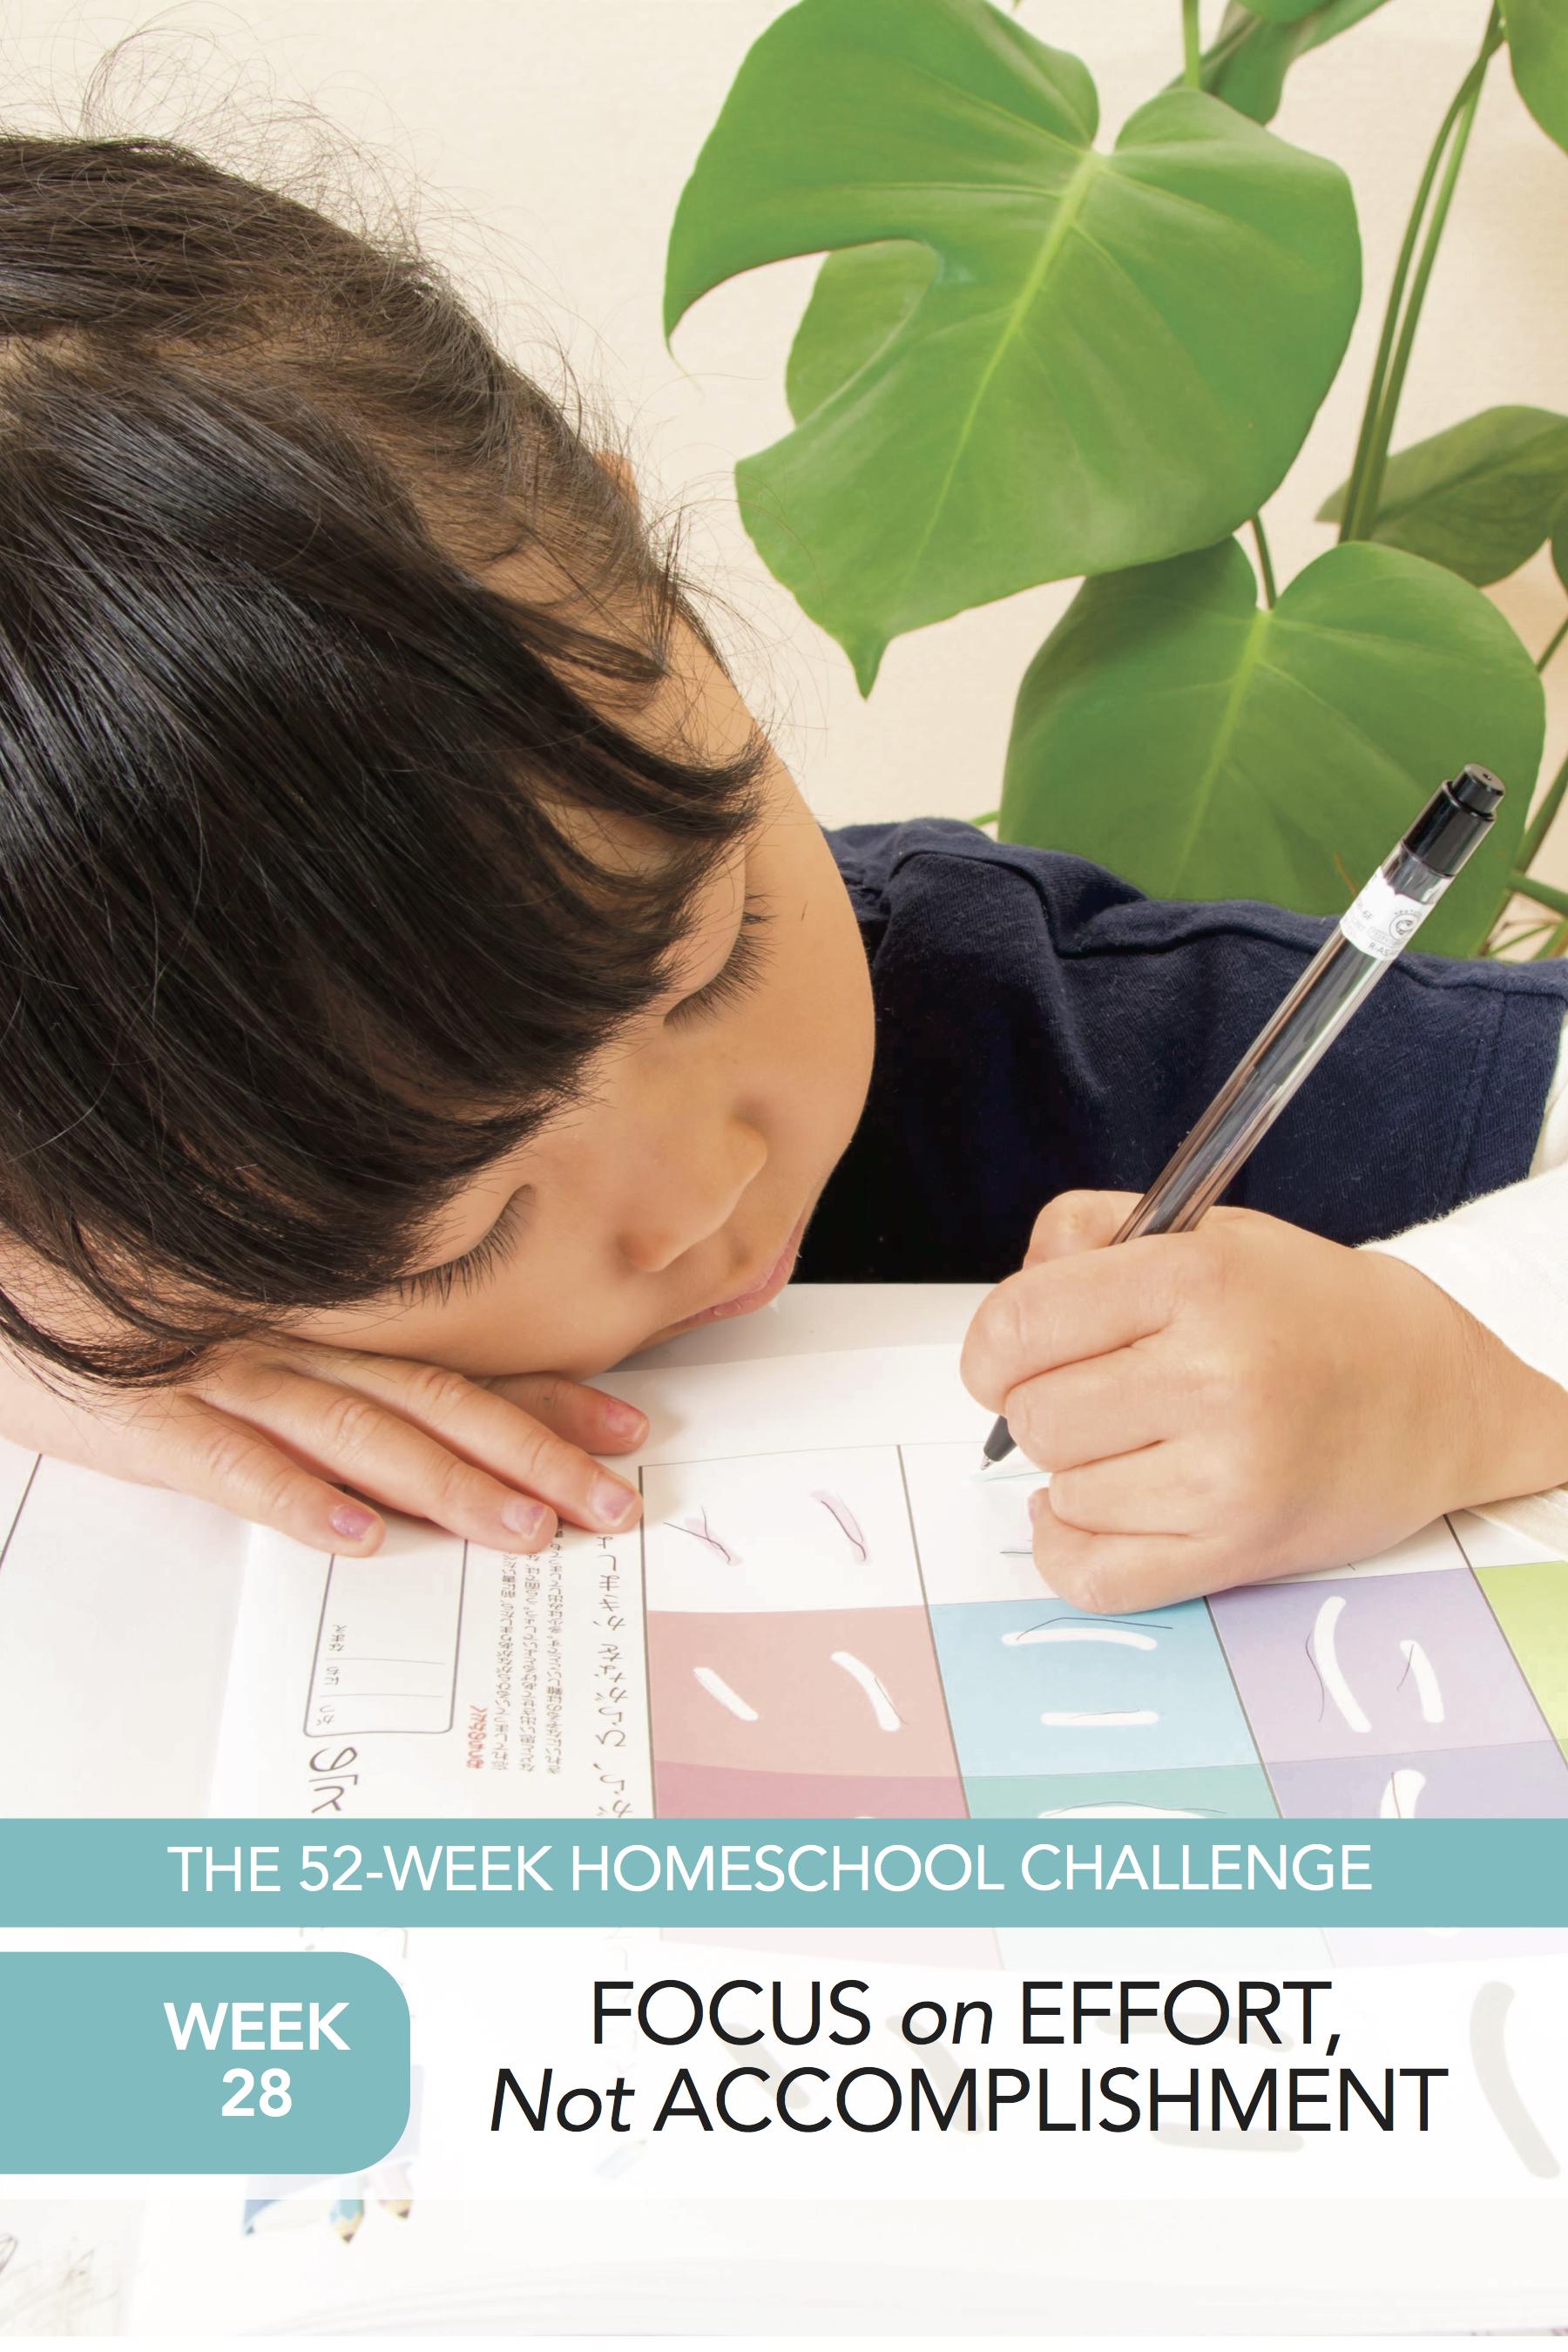 52 Weeks of Happier Homeschooling Week 28: Focus on Effort, Not Accomplishment